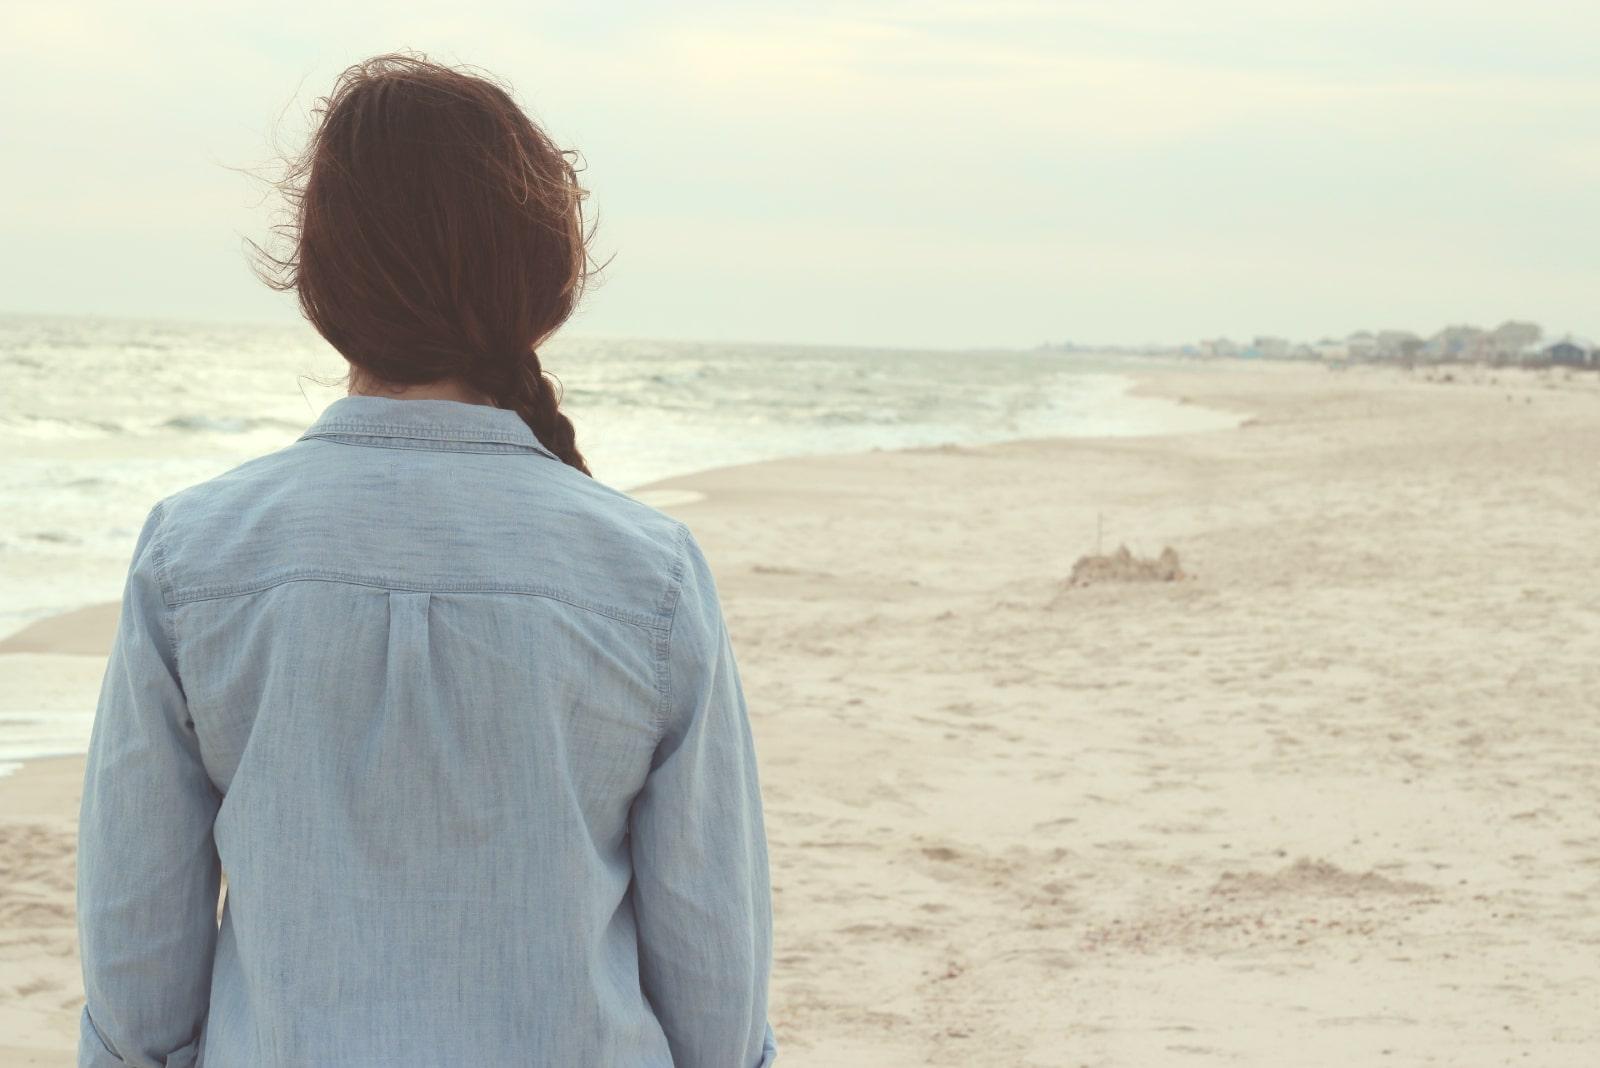 woman in denim shirt standing on shore looking at ocean